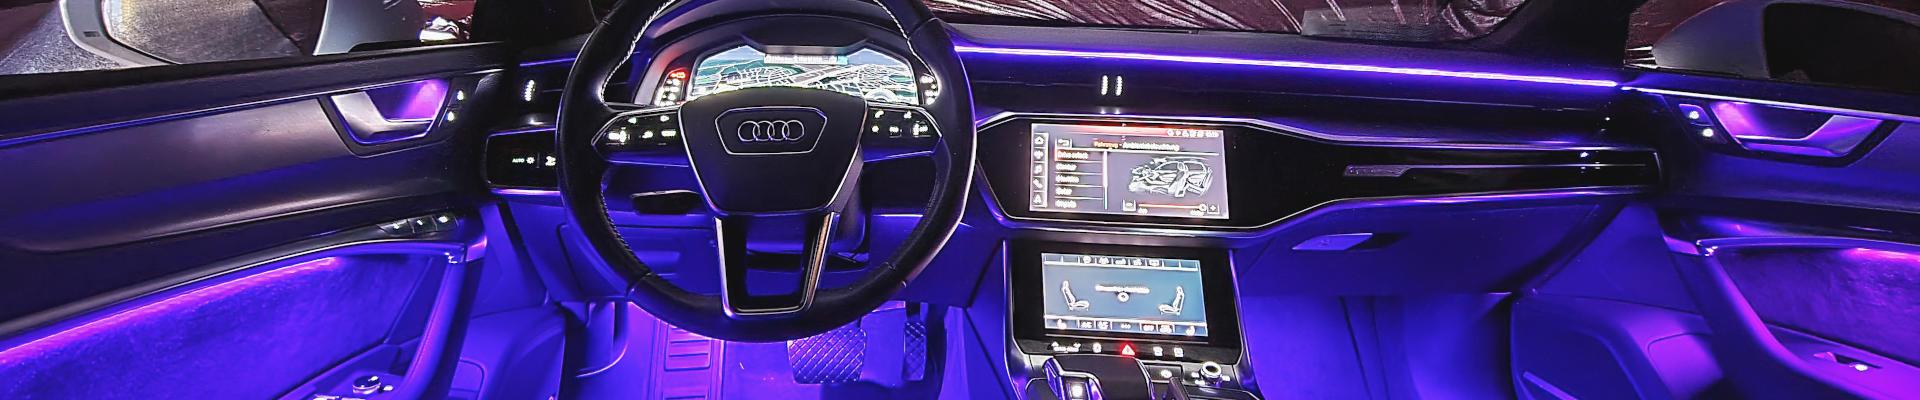 Auto-Ambientebeleuchtung-LED-Troisdorf